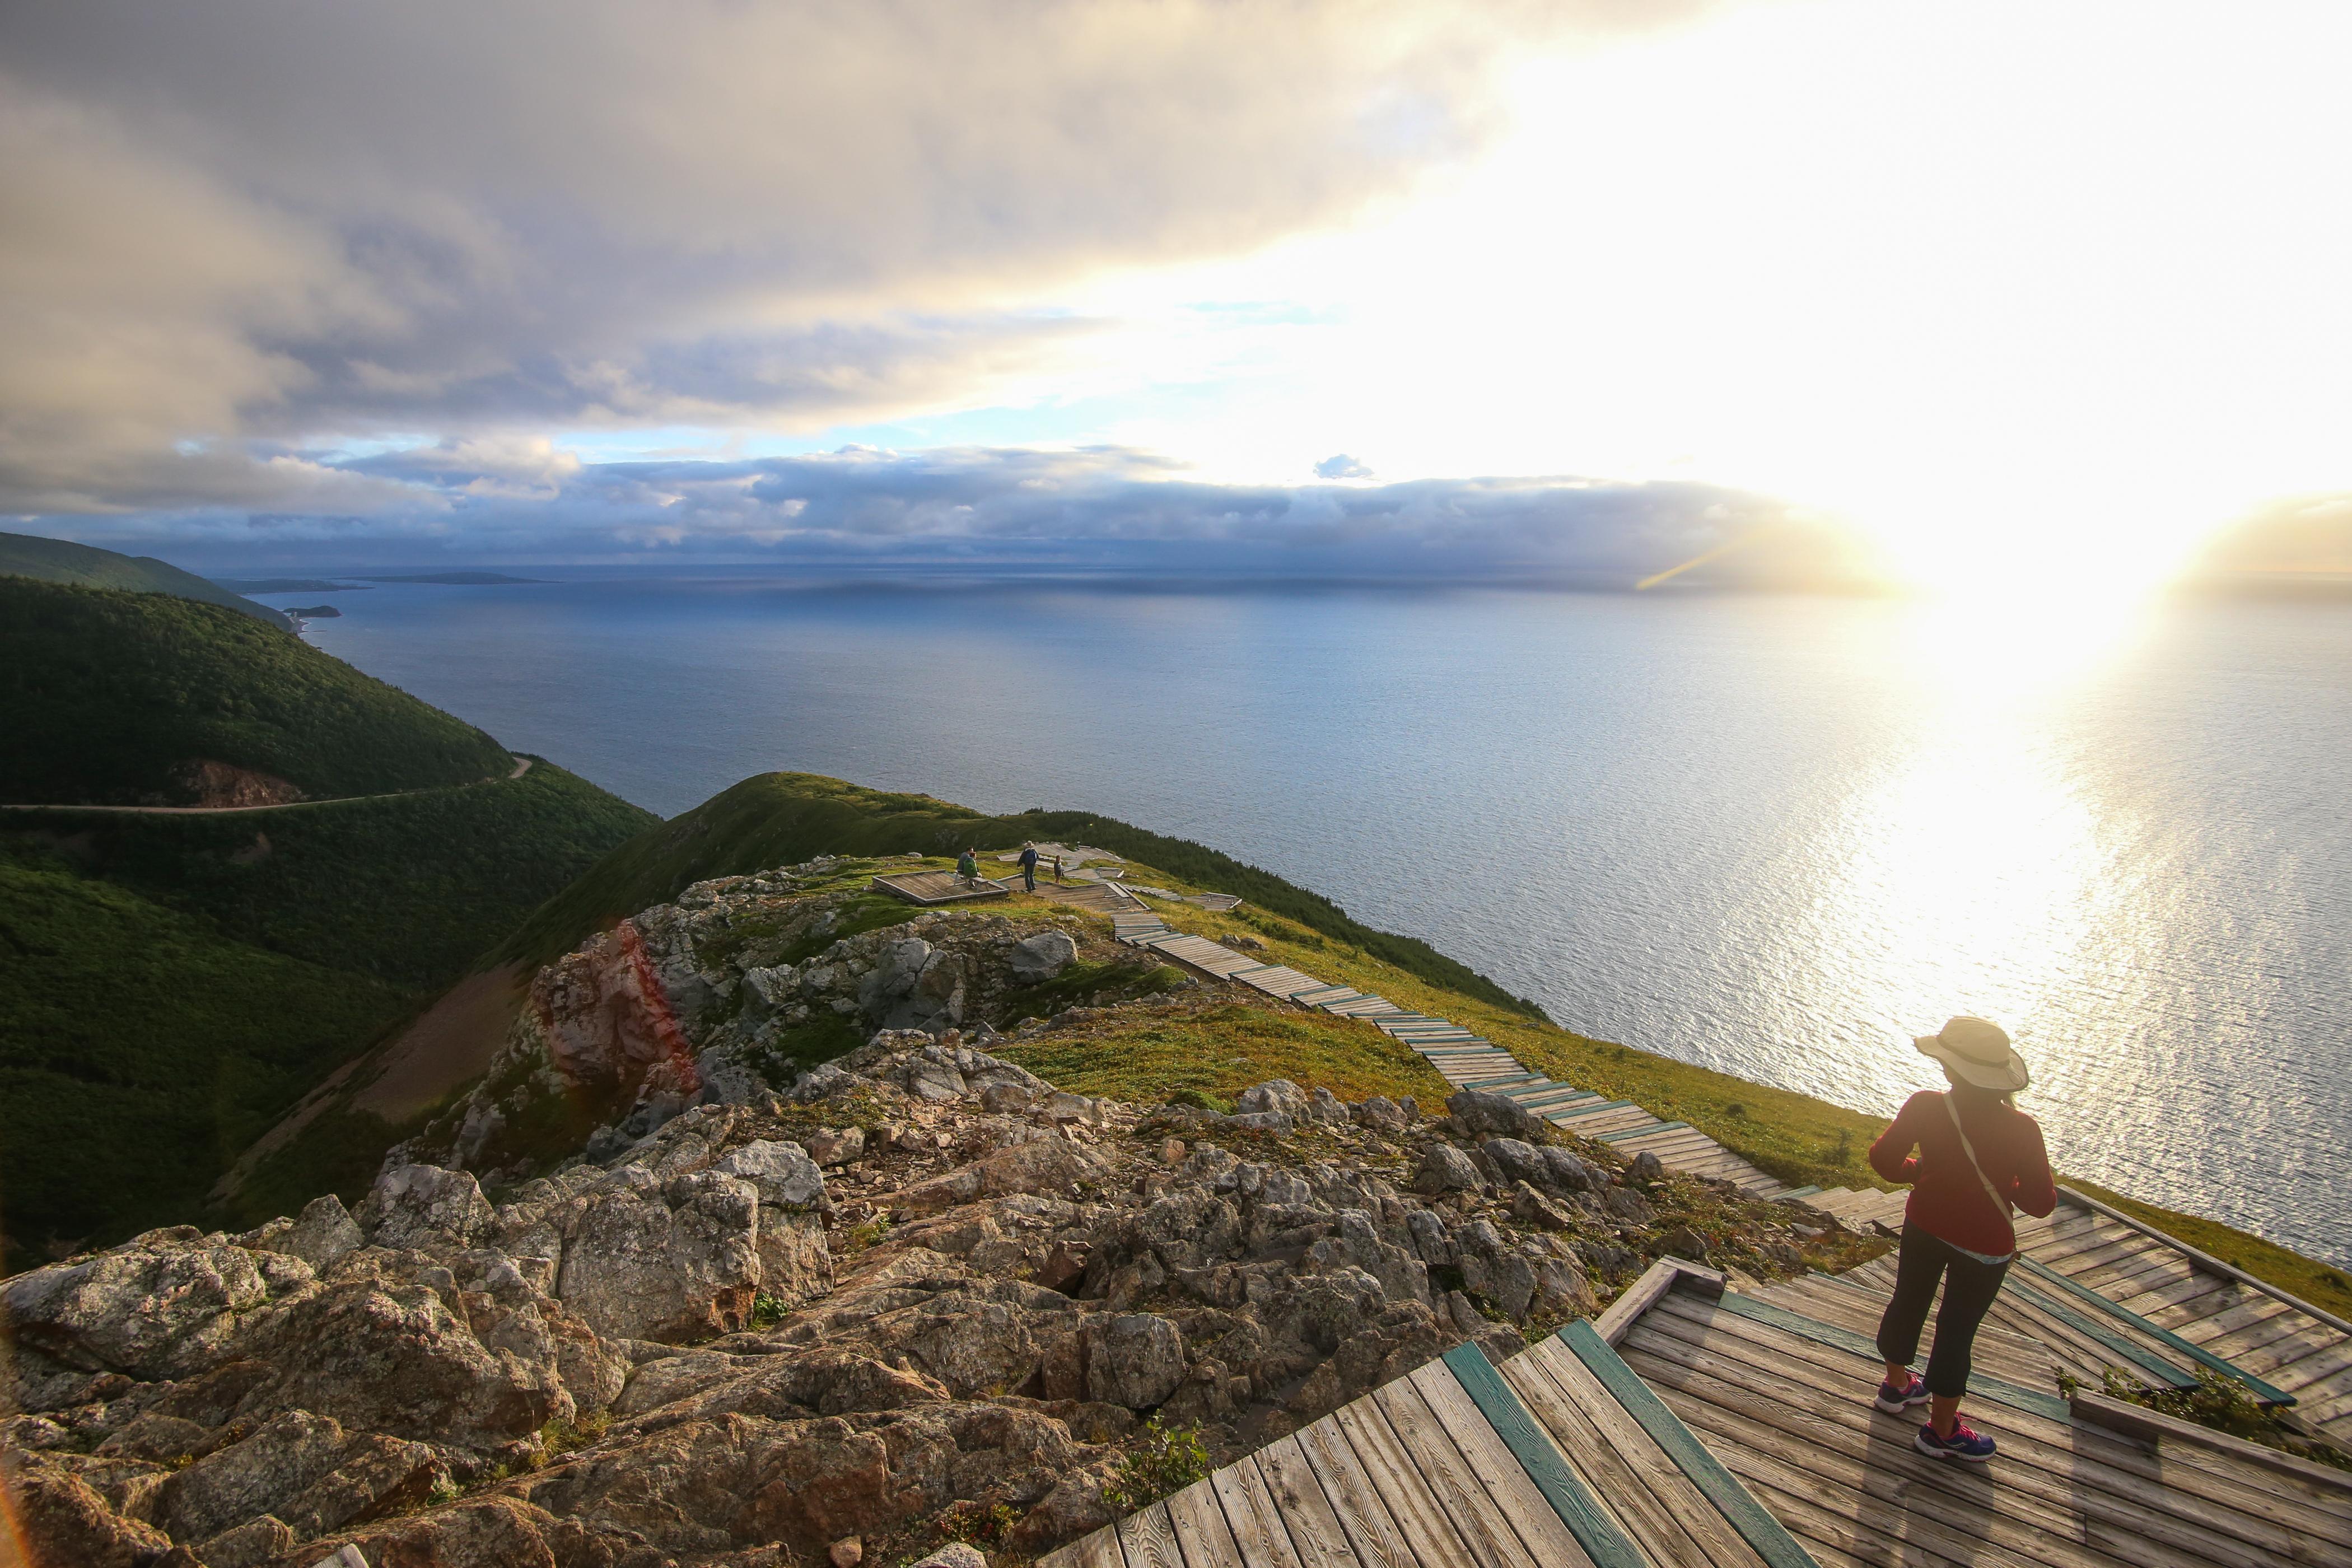 Parks-Canada.Skyline-Trail-Cape-Breton-Highlands-Natnl-Park.jpg?mtime=20170411223020#asset:61862